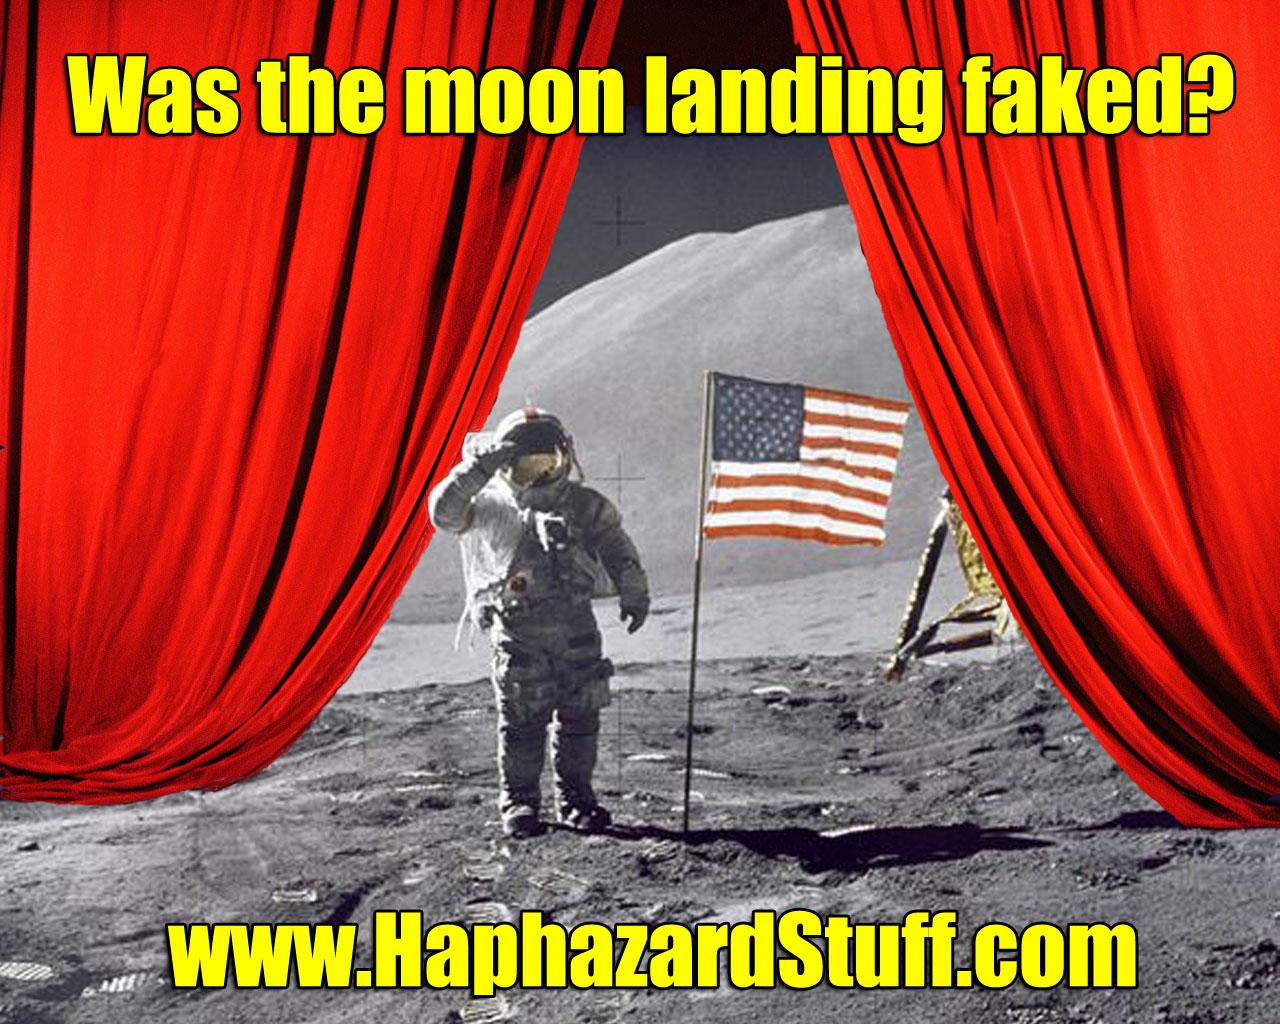 non faked moon landings - photo #32